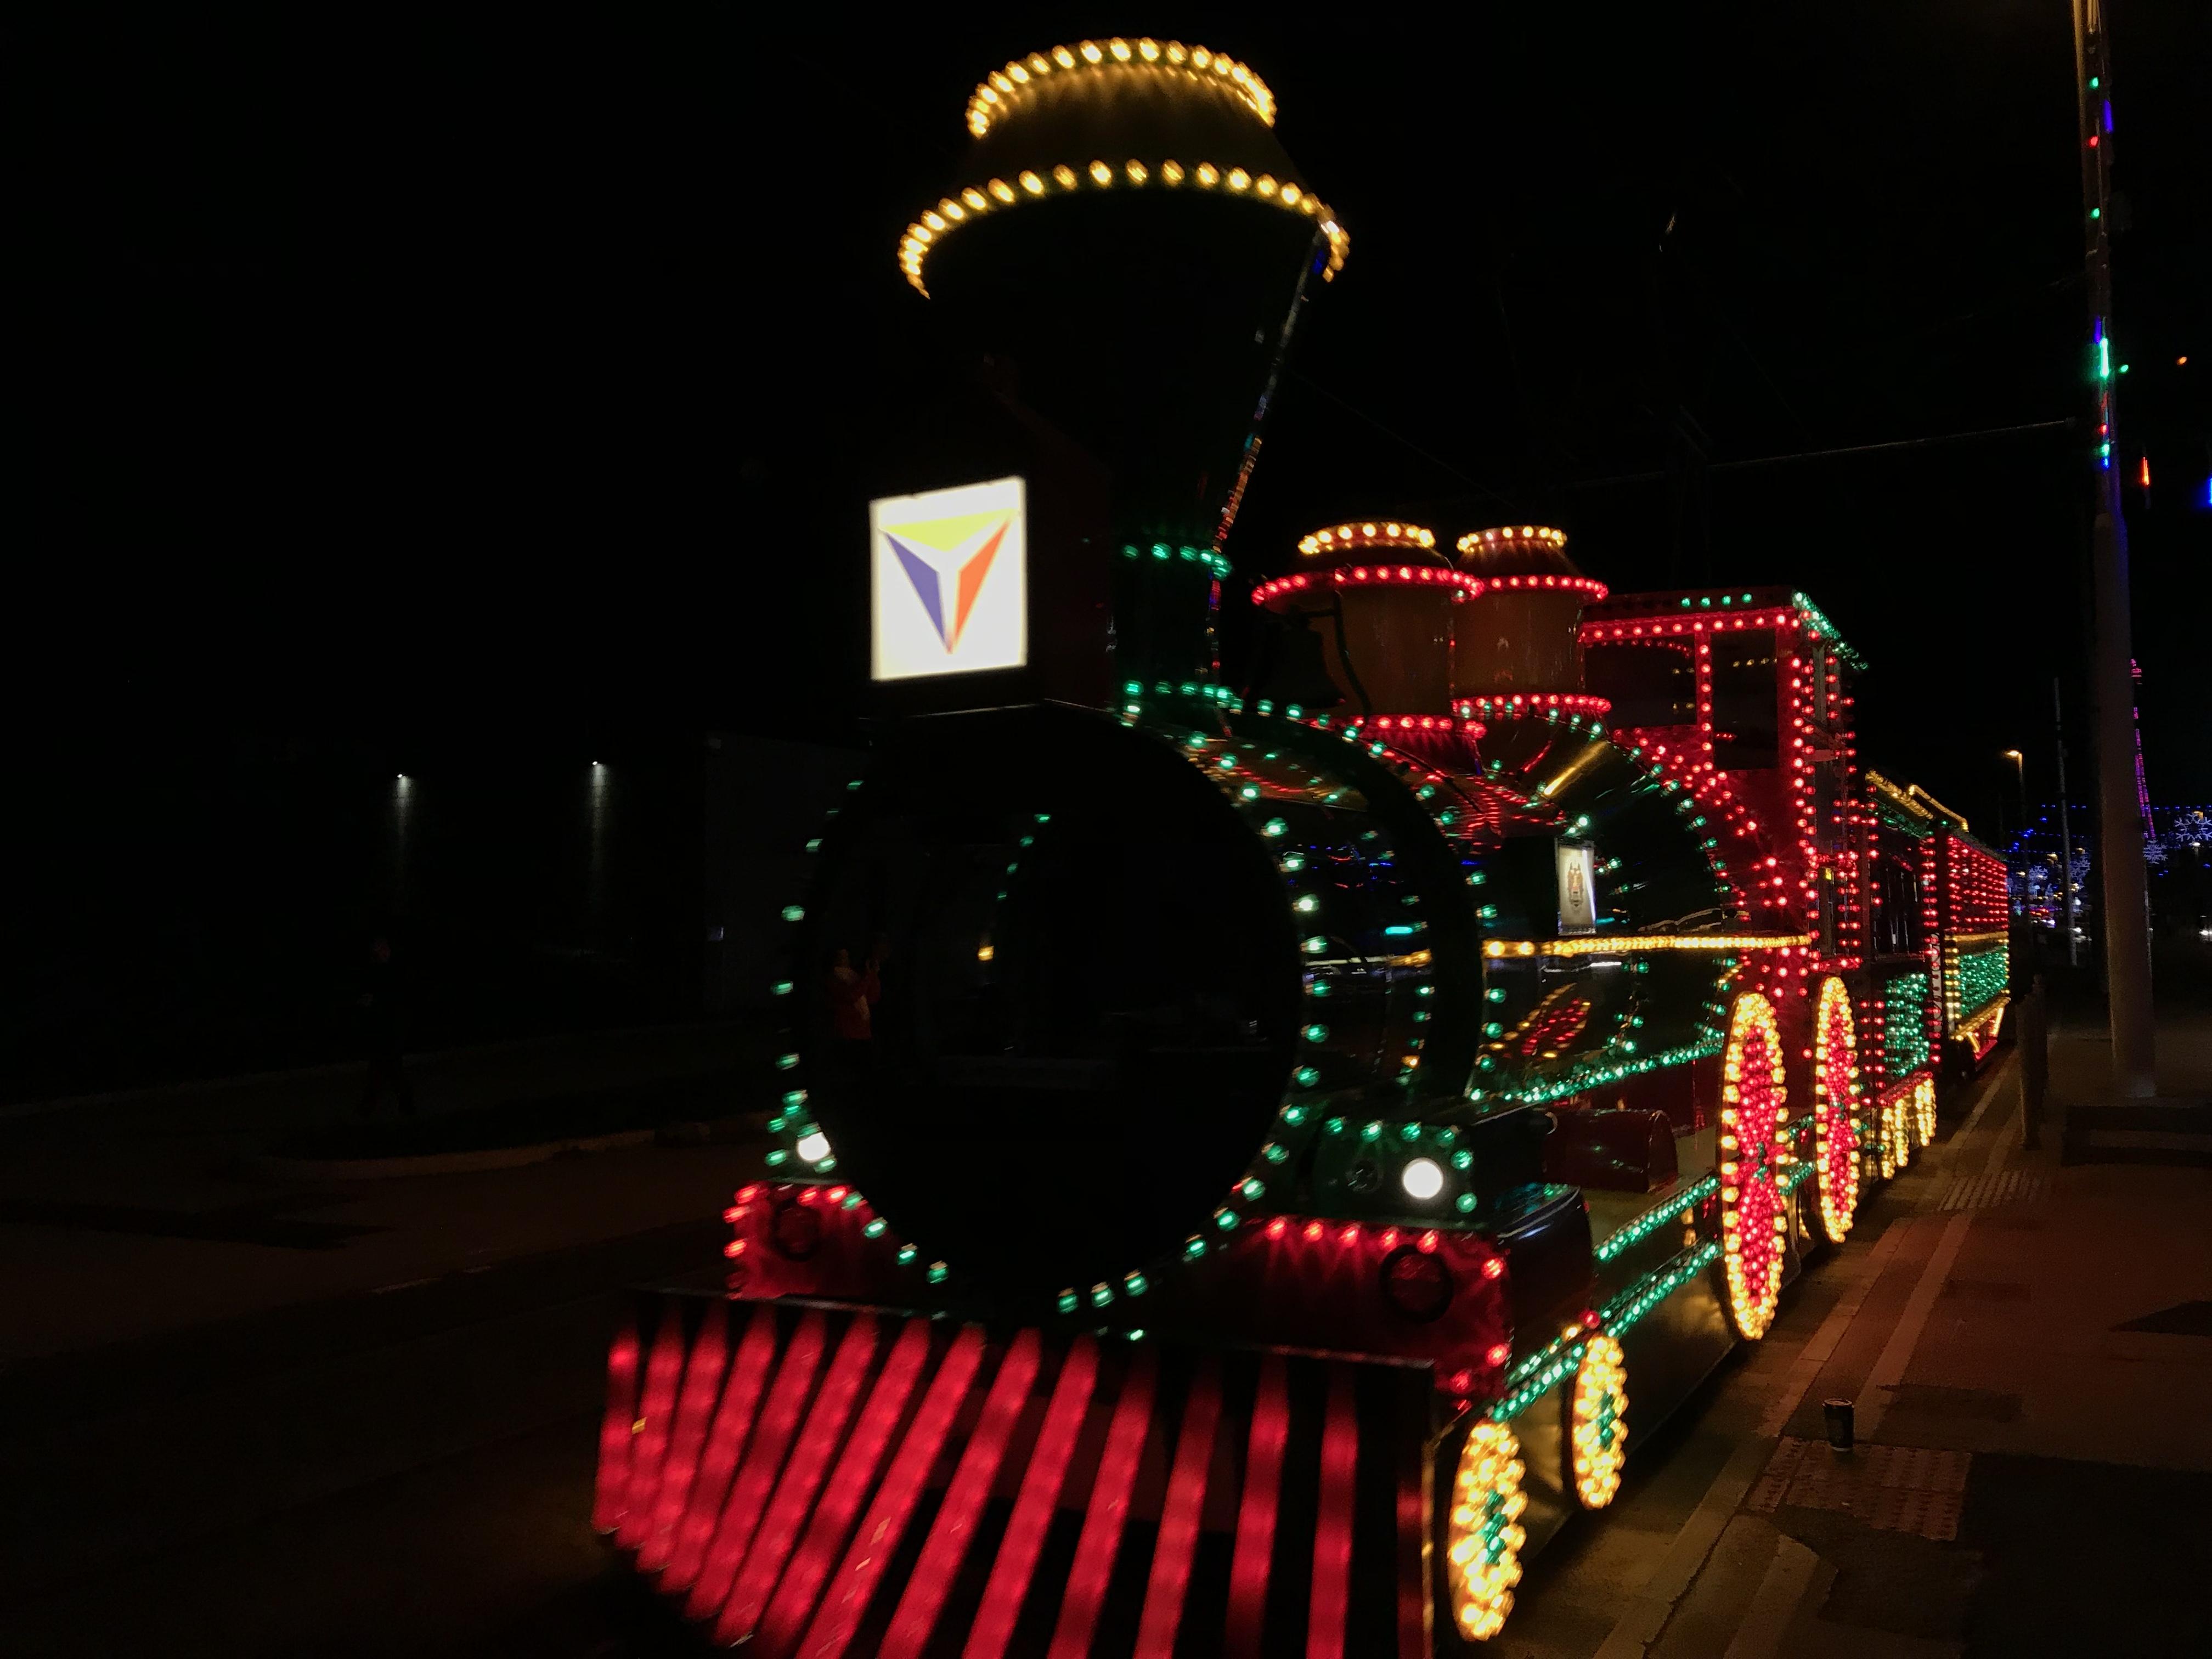 Blackpool tram lit up